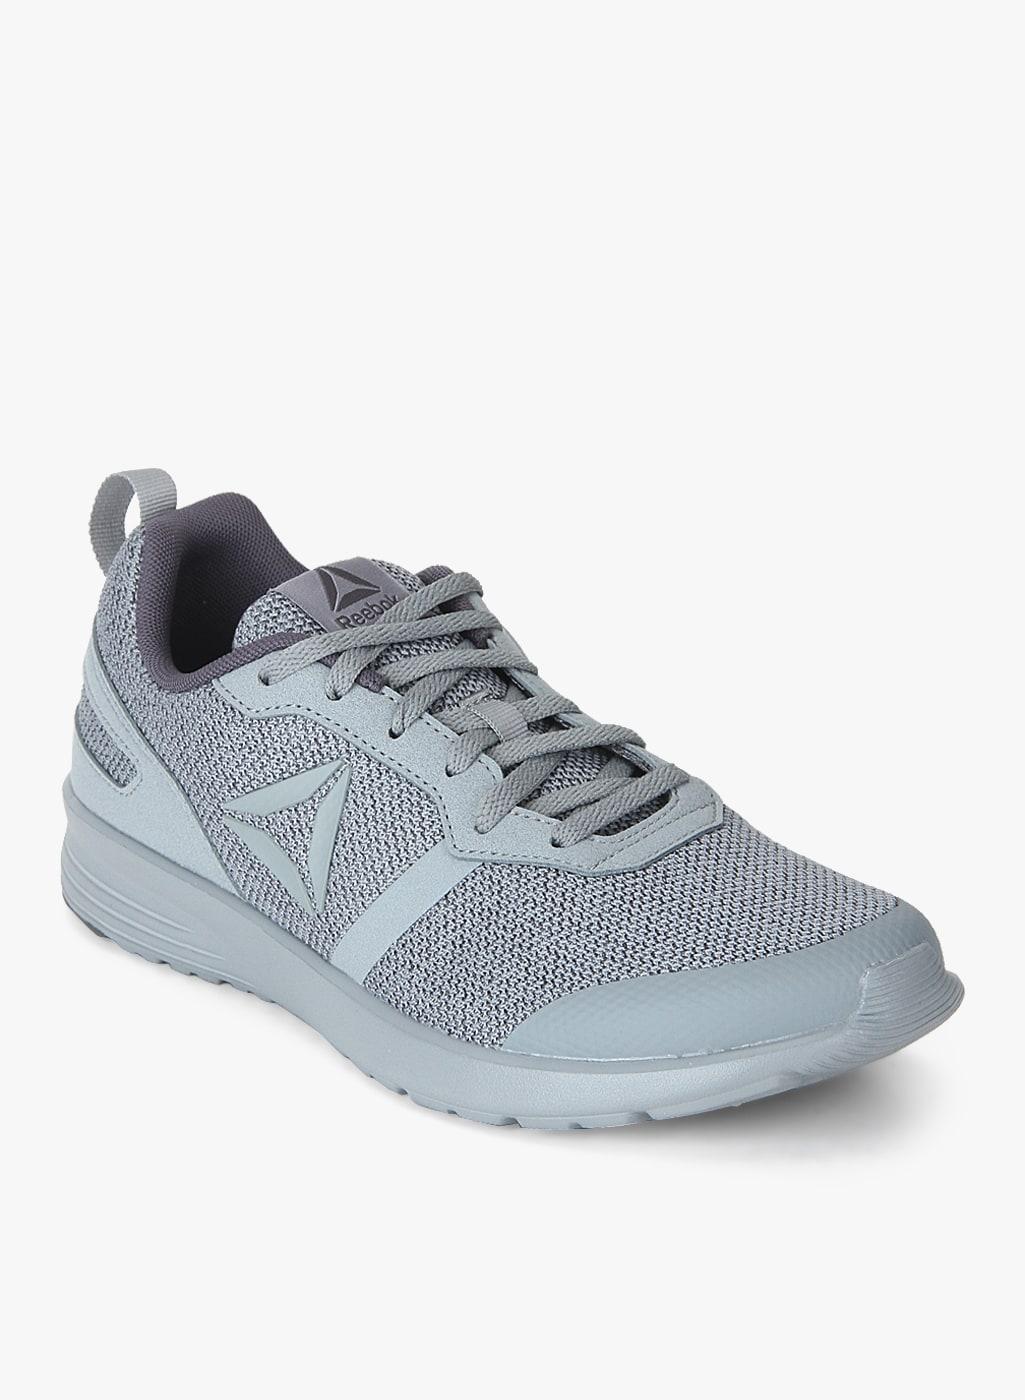 a8e706b60 Buy Reebok Men Blue Driftium Ride Running Shoes - Sports Shoes for ...